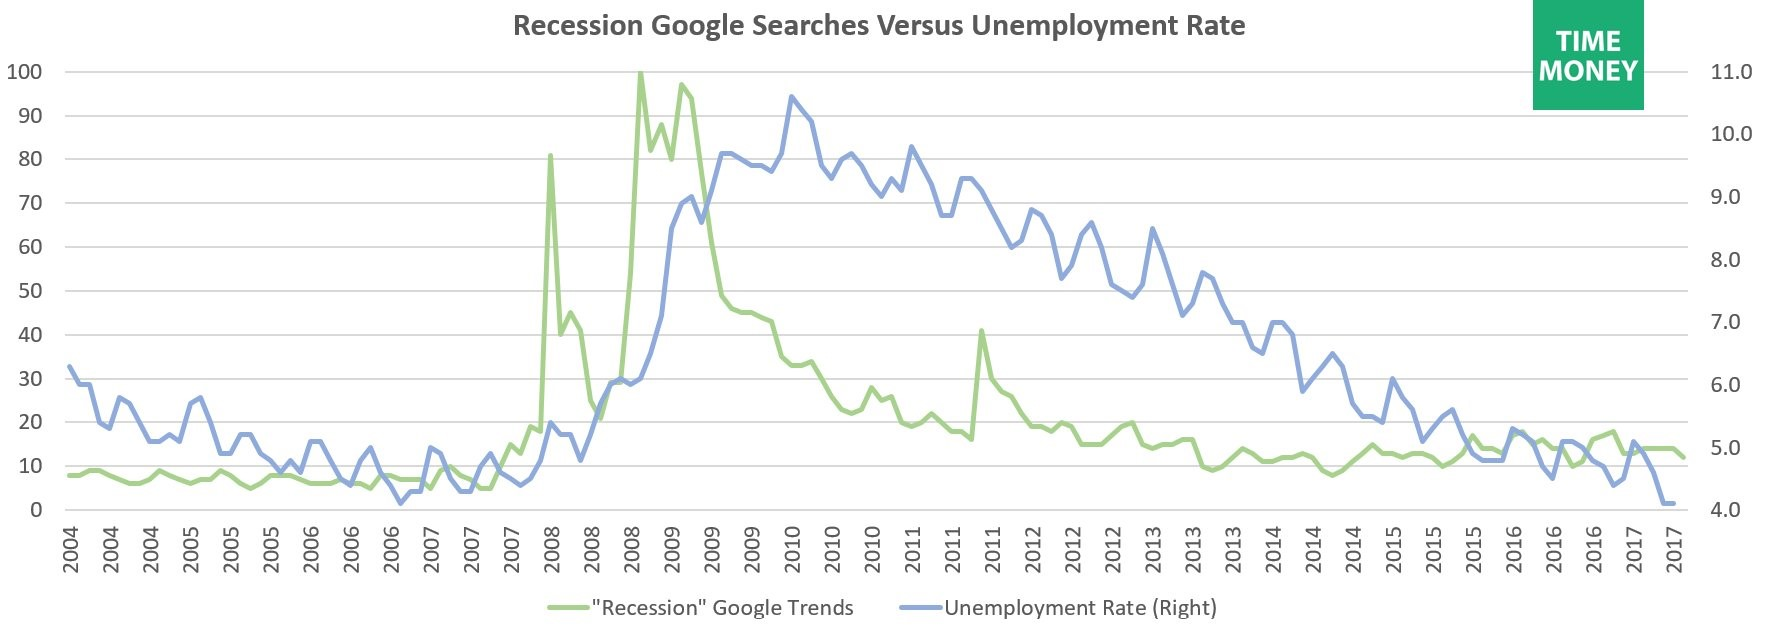 Recession Search Versus Unemployment